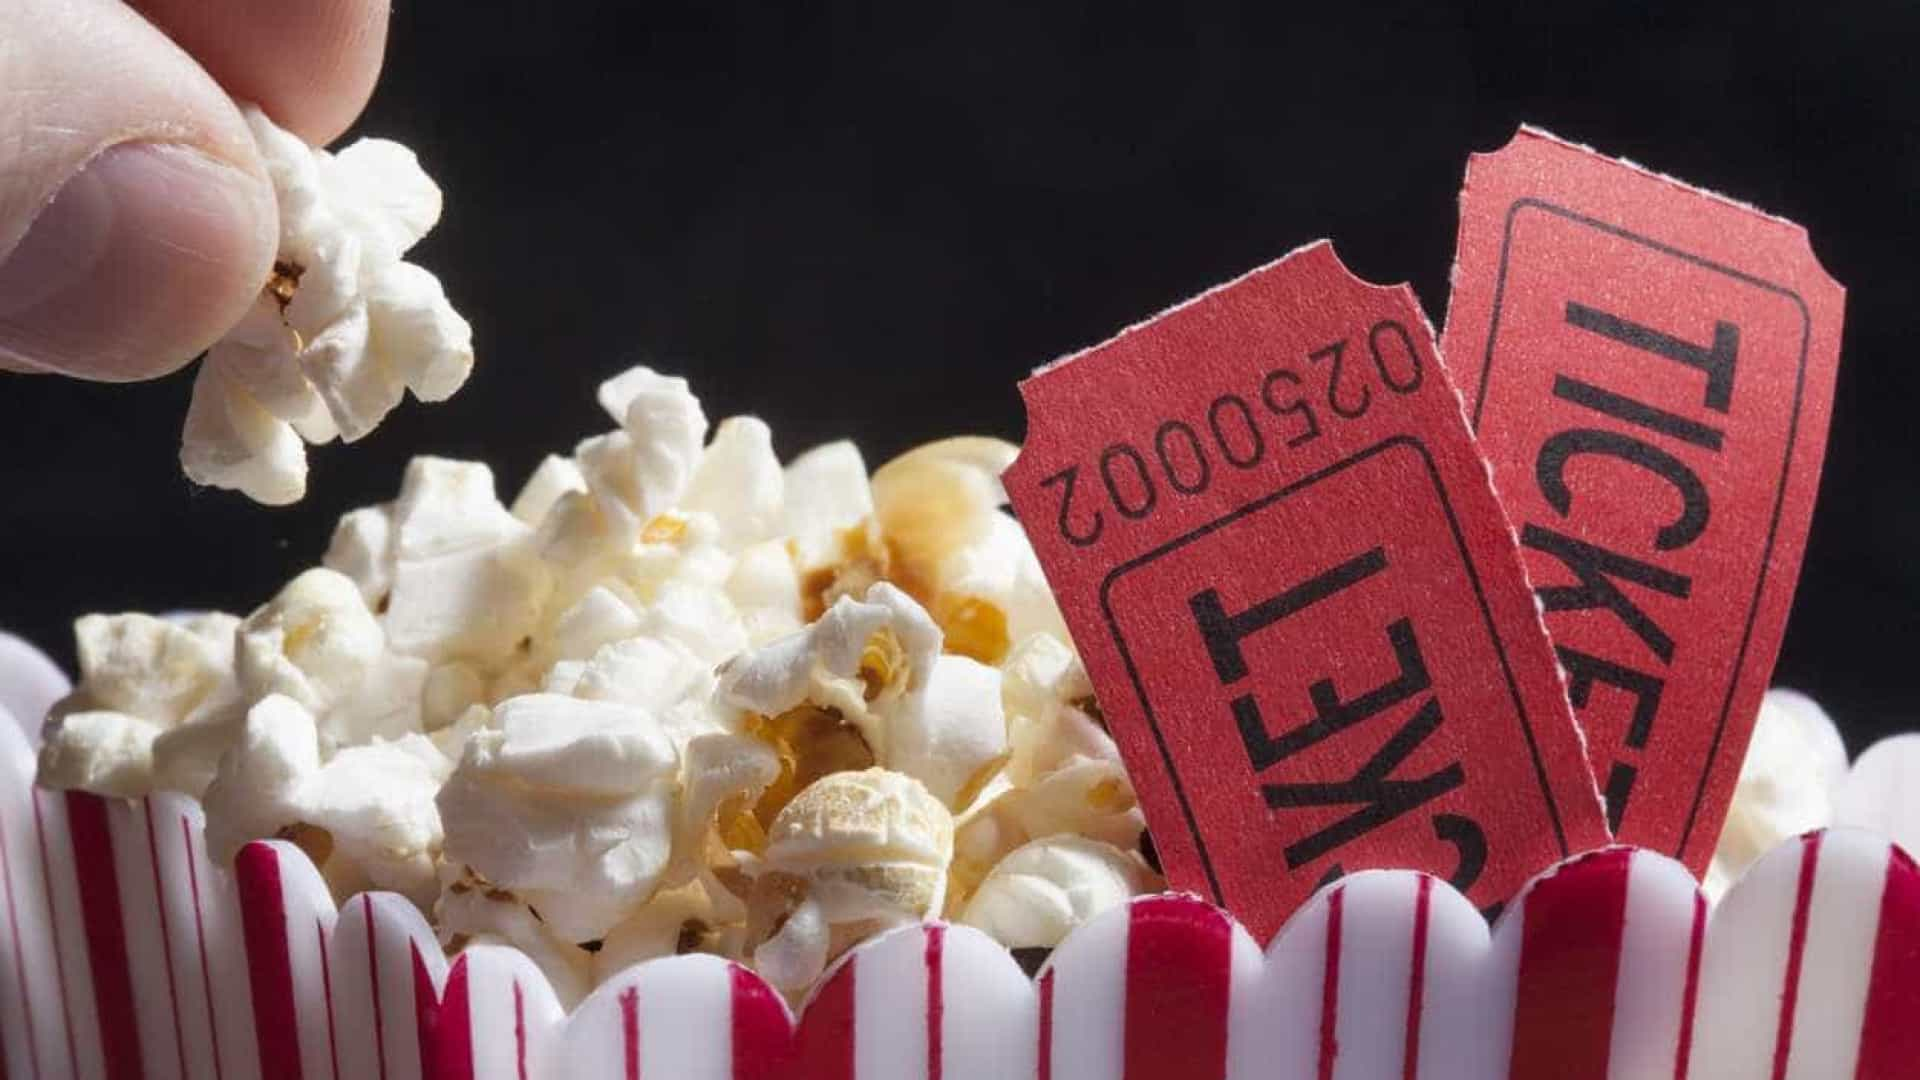 'Incredibles 2' manteve liderança do box-office